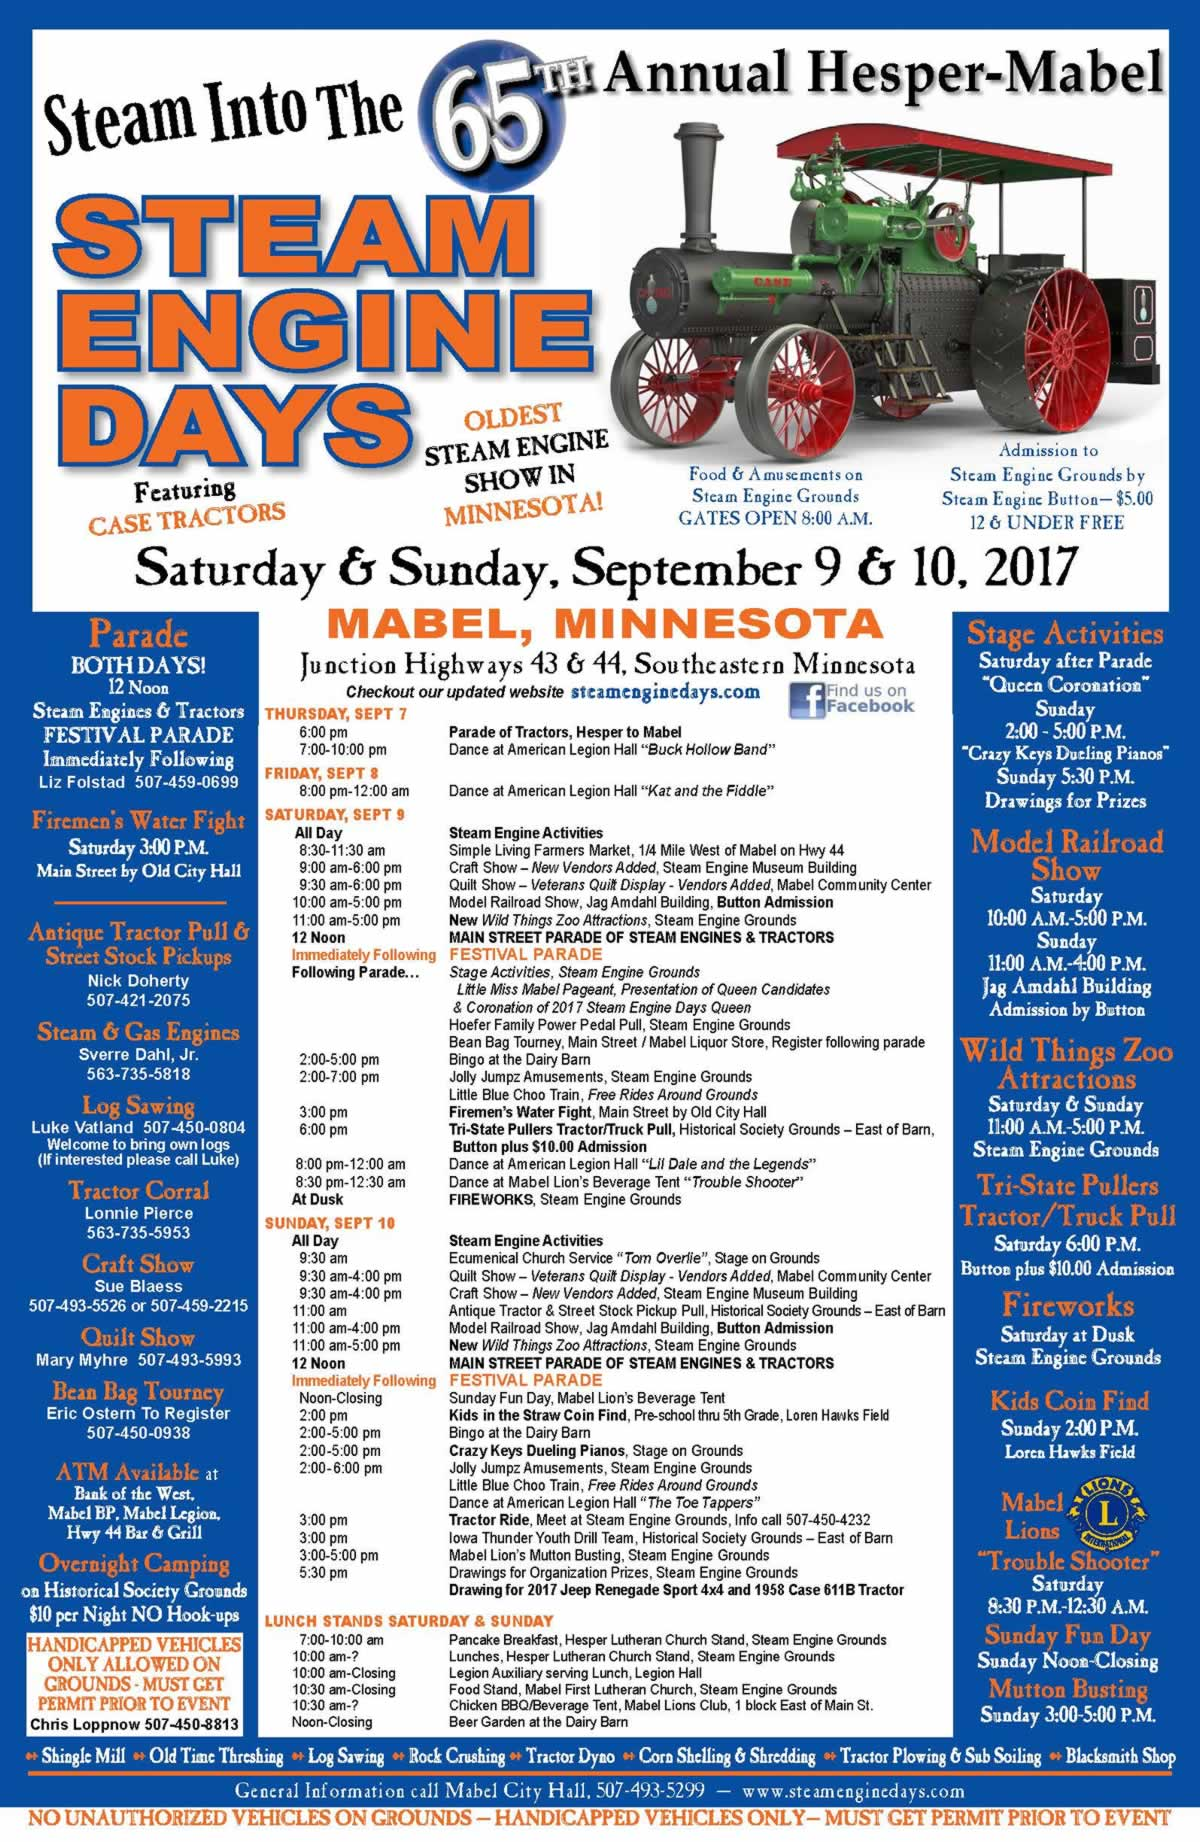 Hesper-Mabel Steam Engine Days 2017 - Mabel, Minnesota